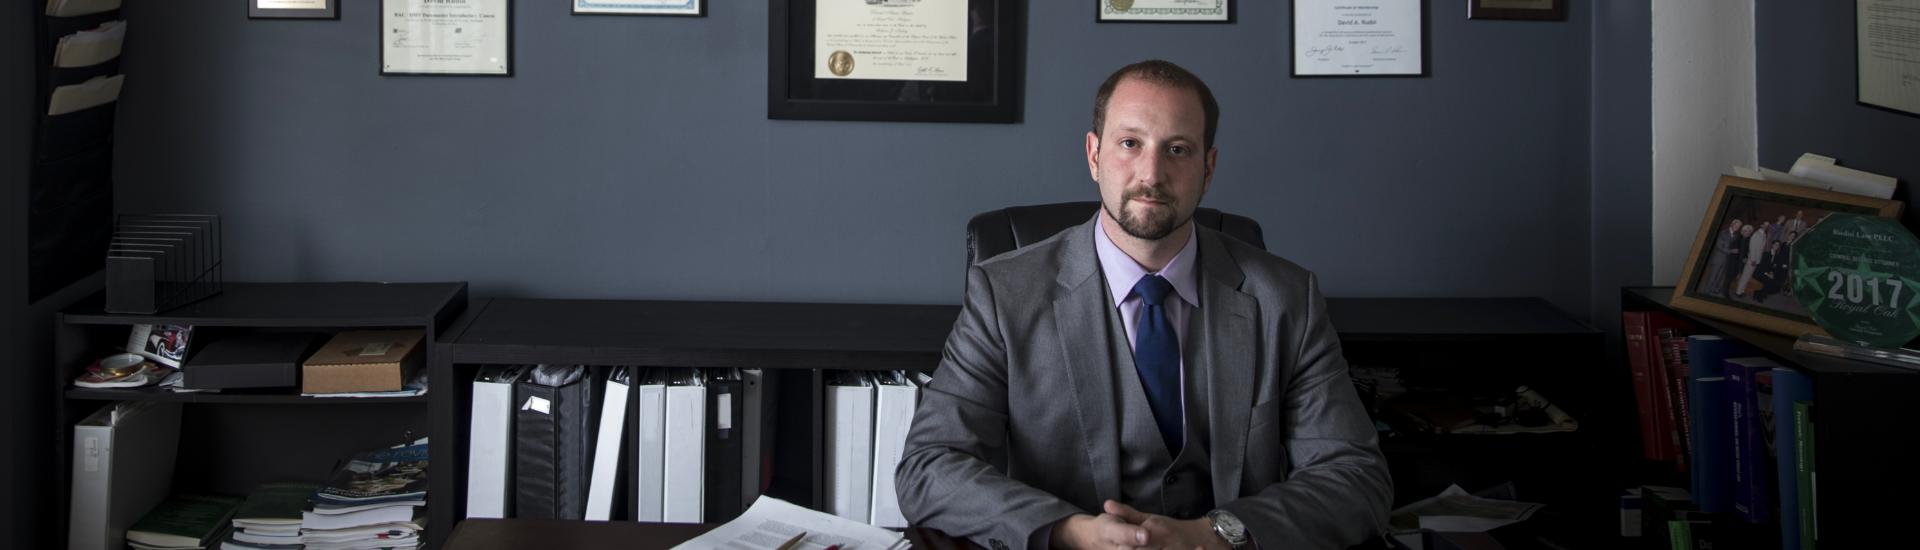 Dave Rudoi at his desk